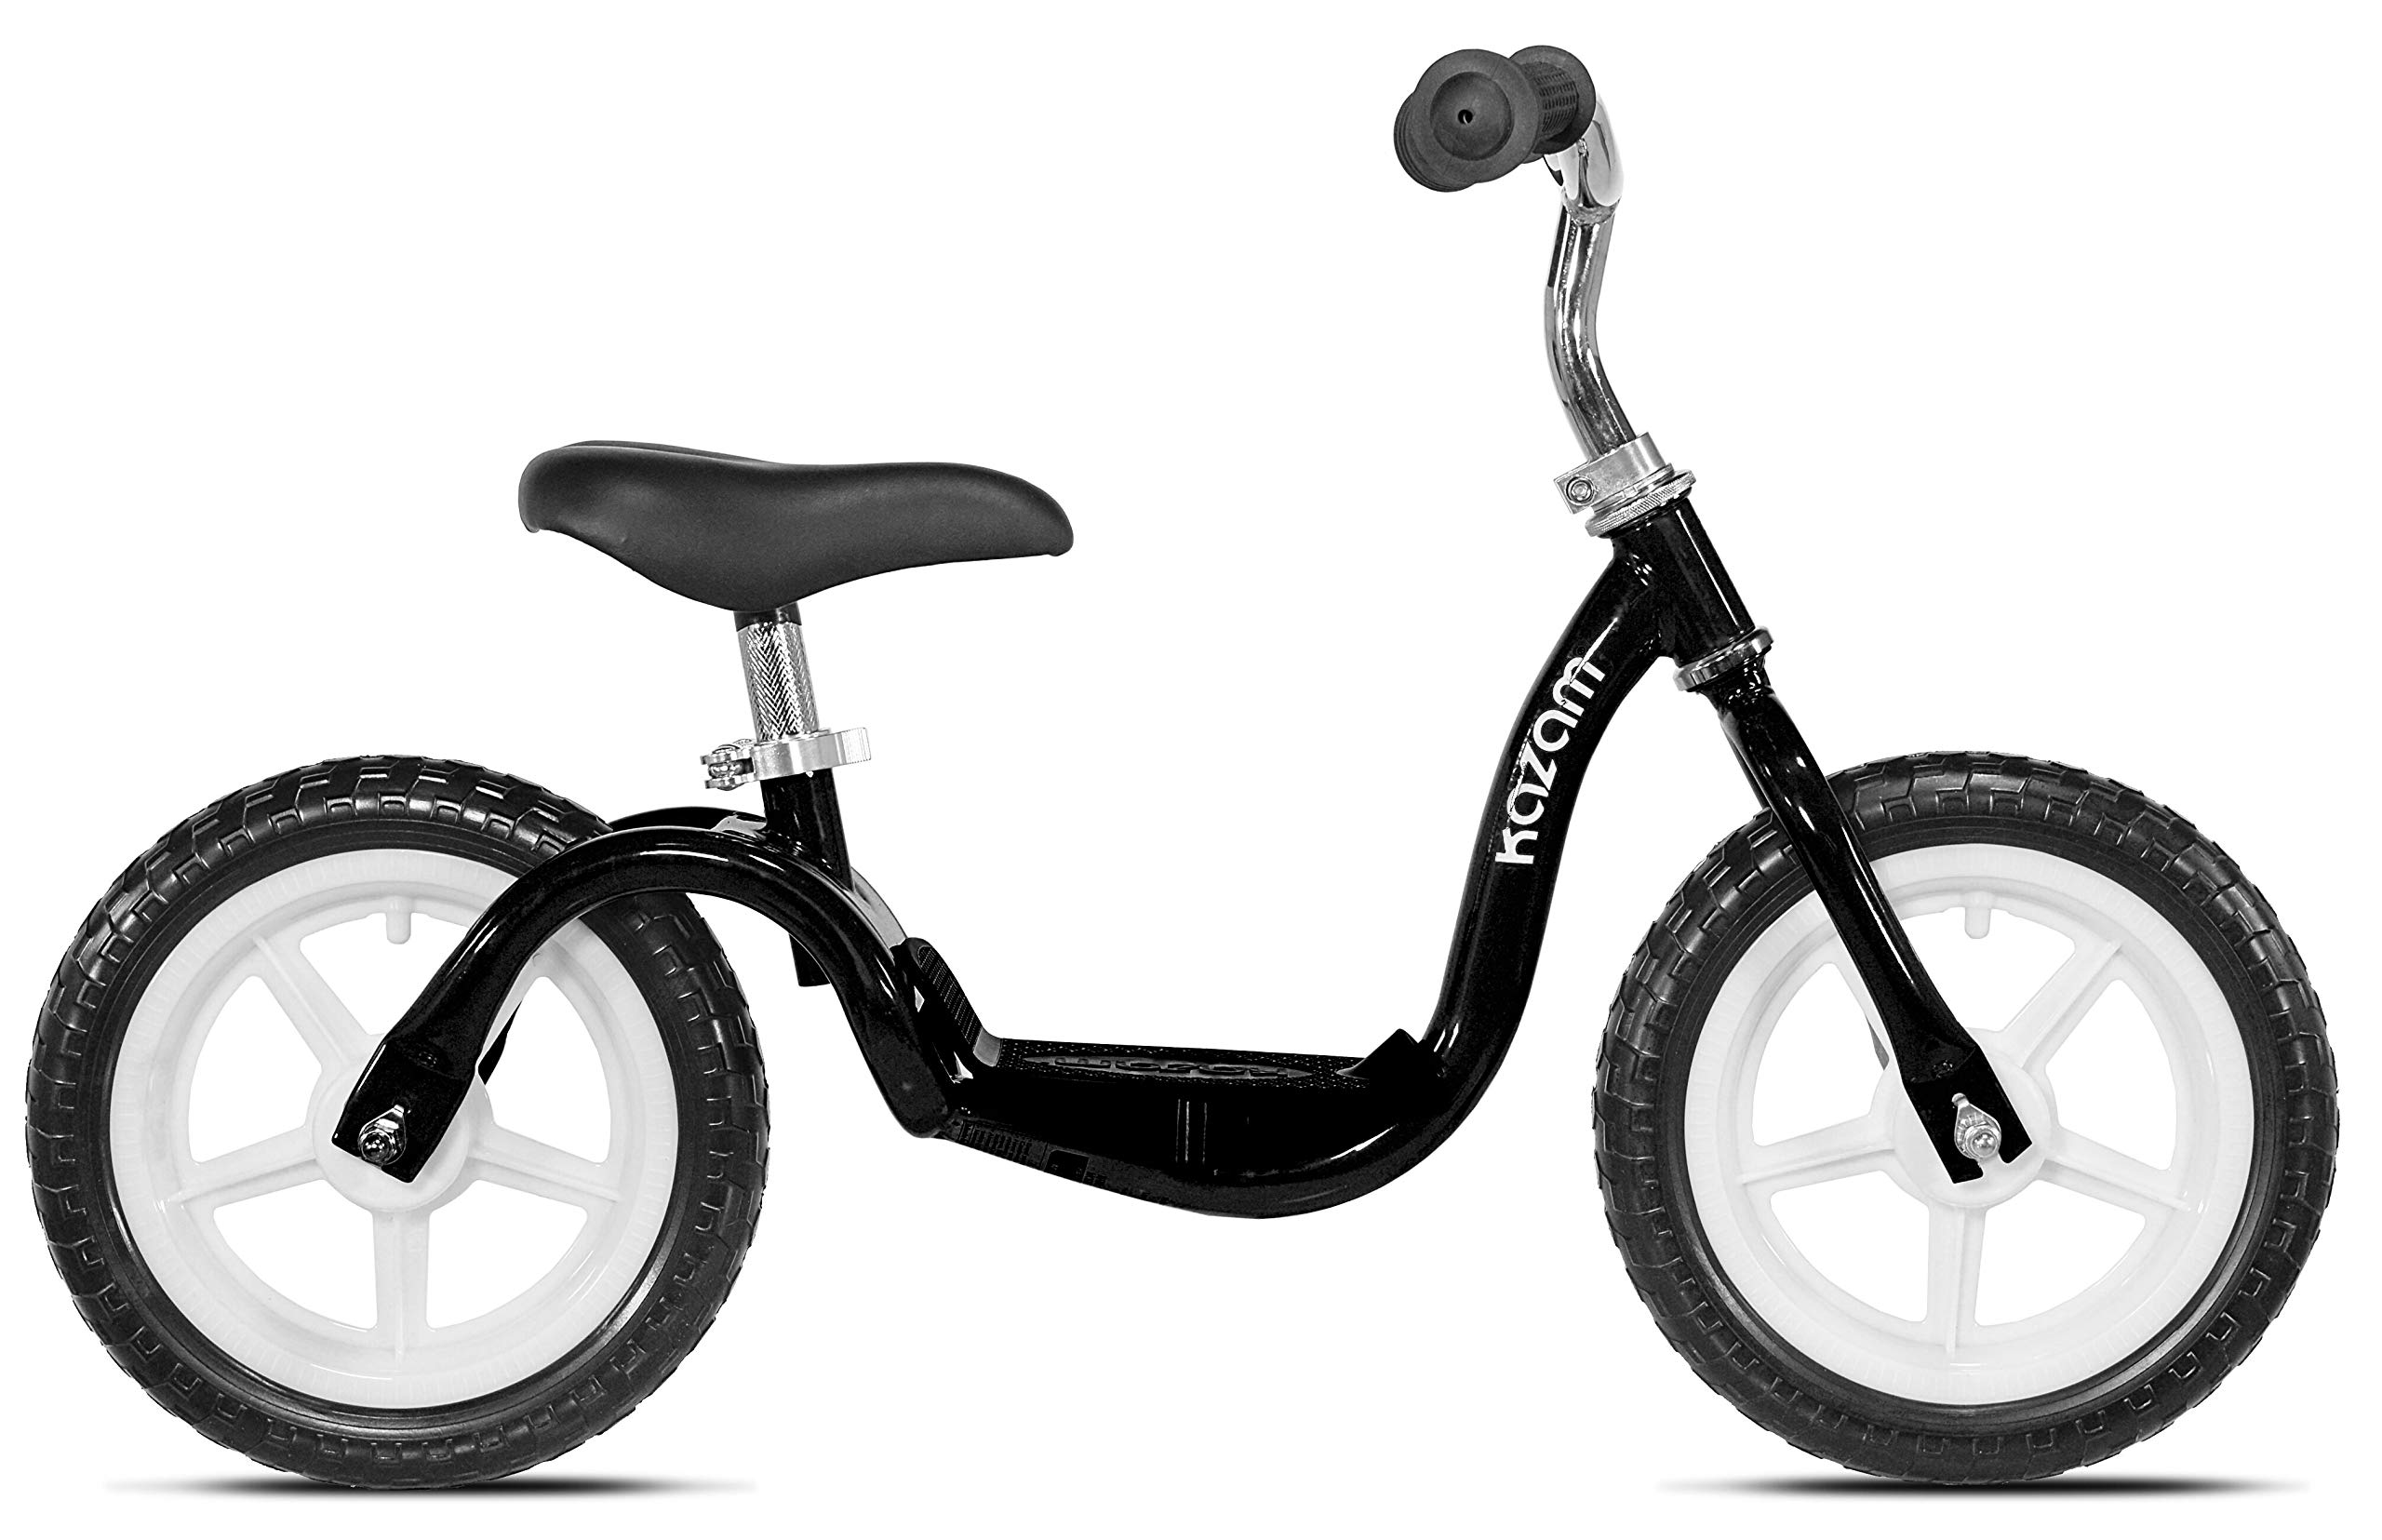 KaZAM Tyro V2E Adjustable Step-Through Learning Balance Bike for Kids, Black